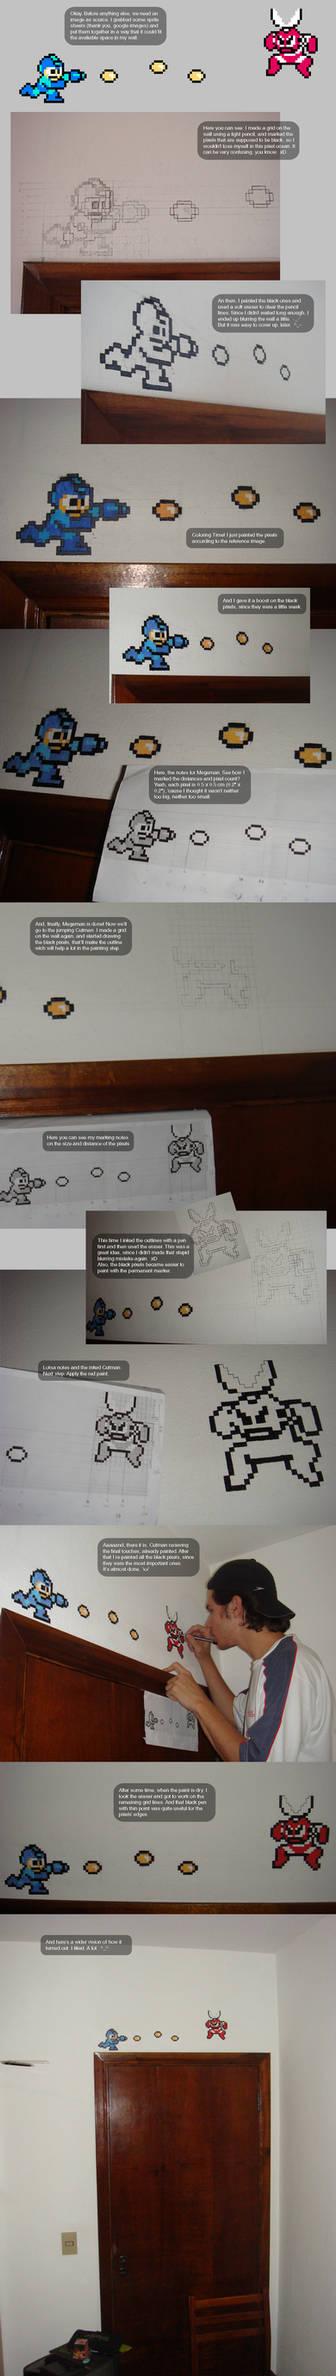 Megaman Painting Walkthrough